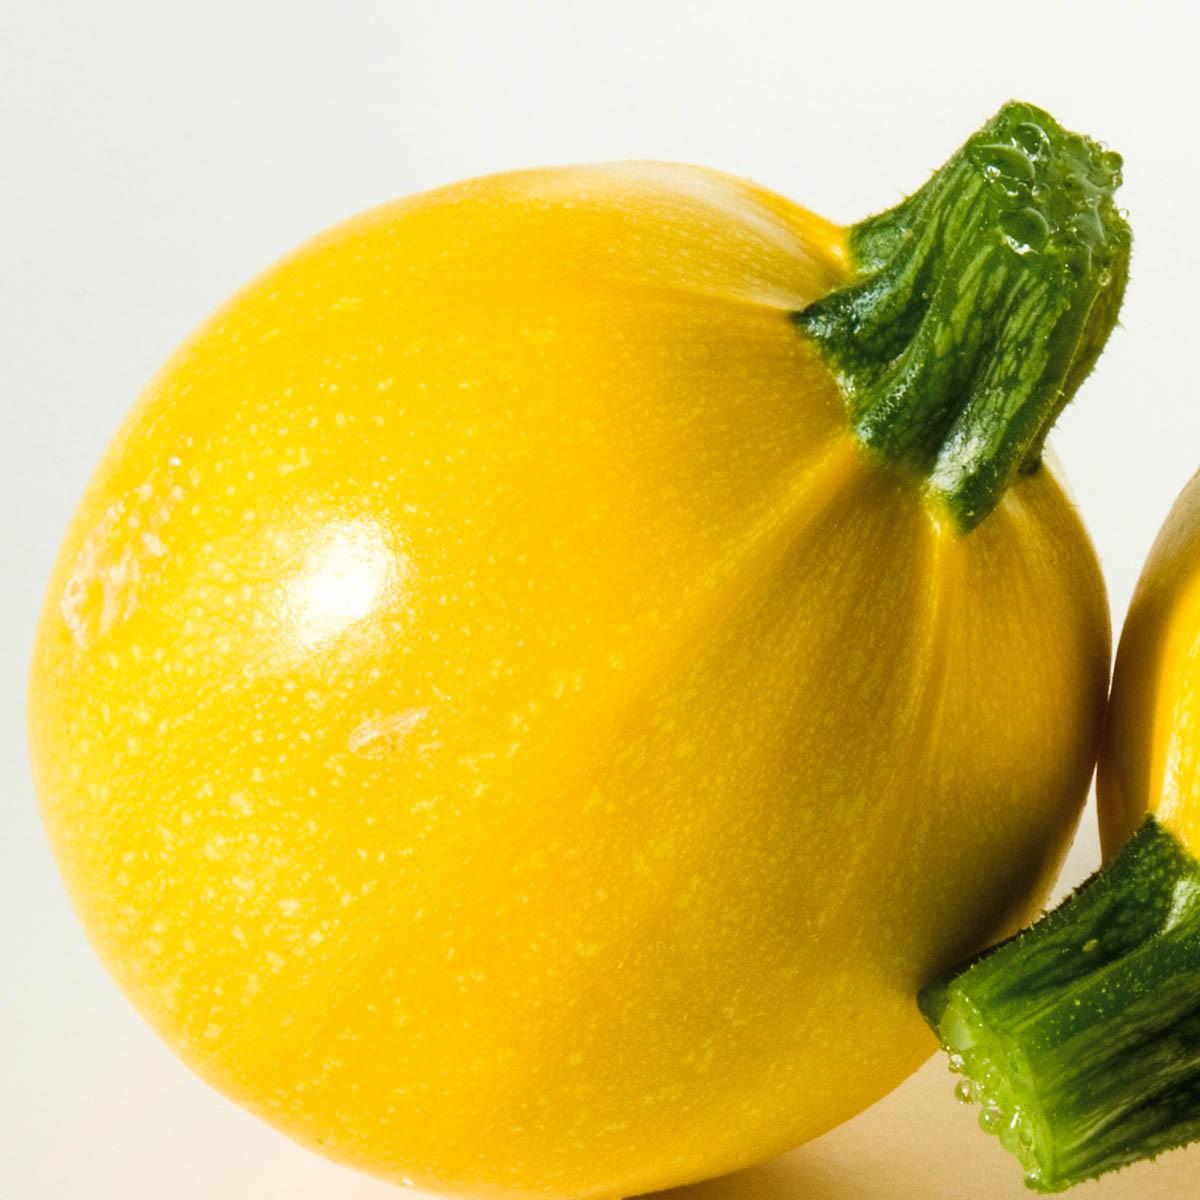 Runde gelbe Zucchini 'Floridor'